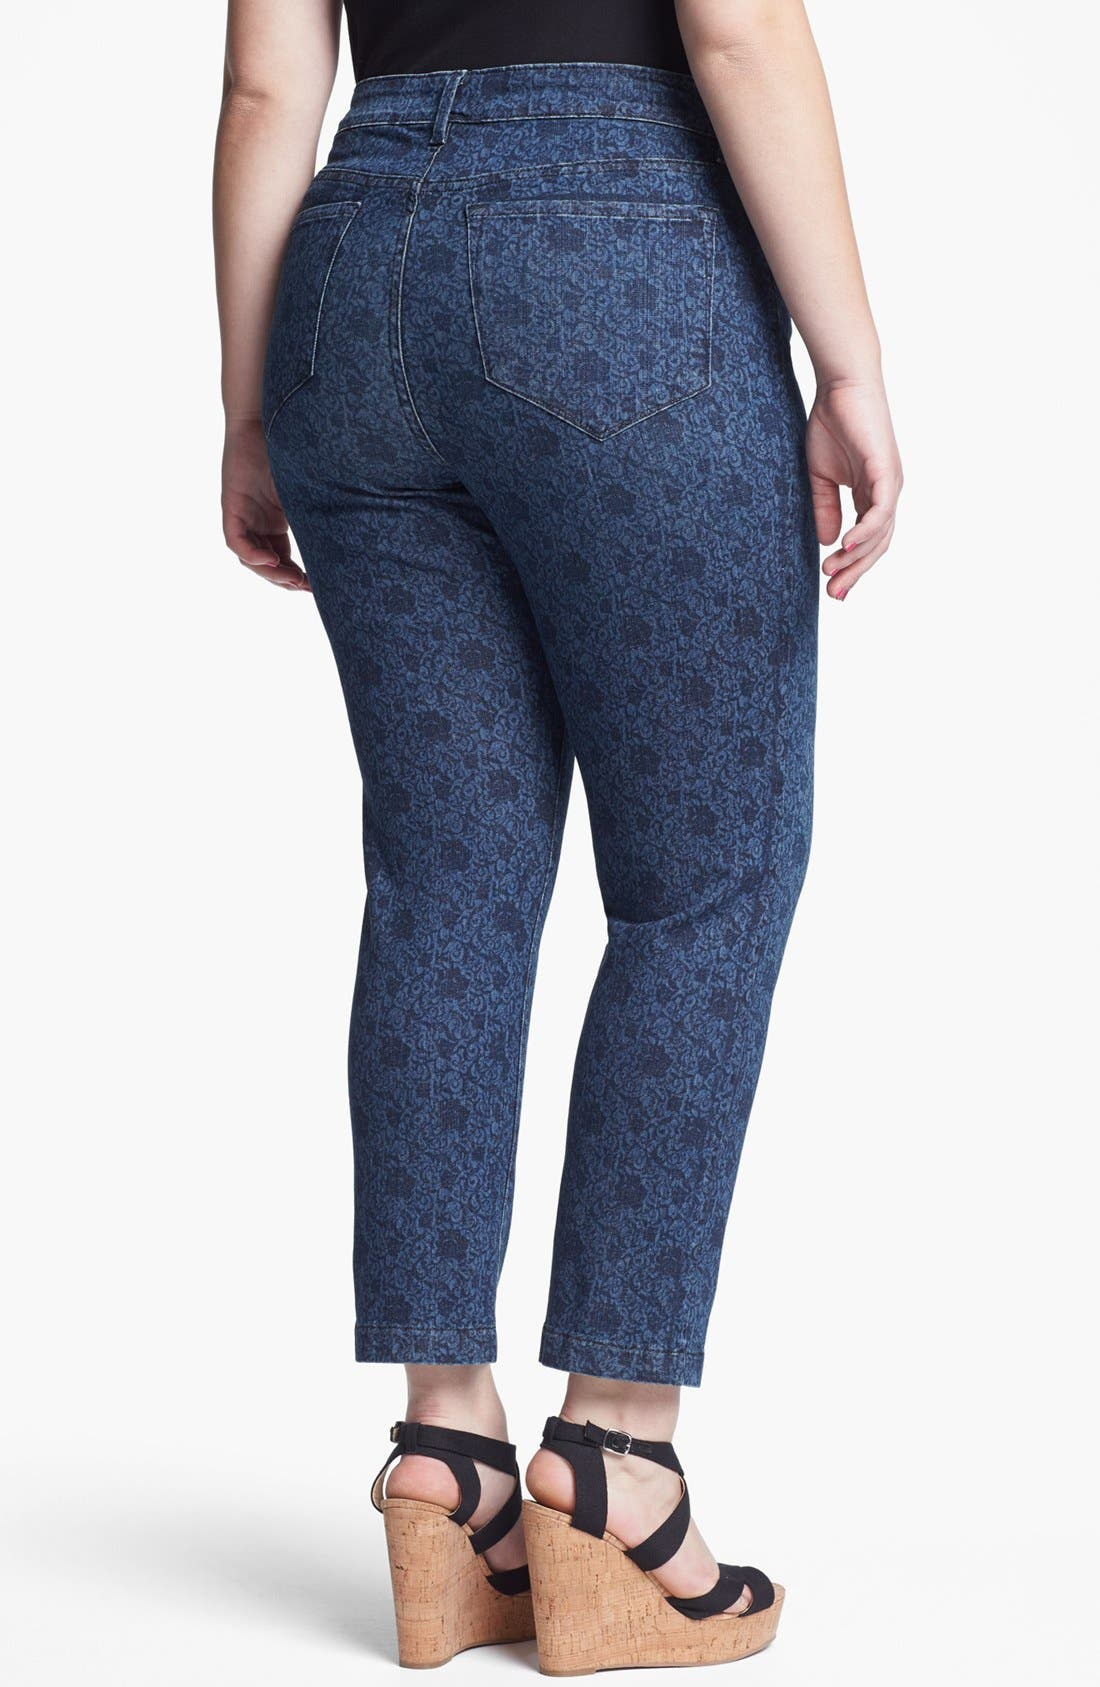 Alternate Image 2  - NYDJ 'Audrey' Rose Print Ankle Jeans (Plus Size)